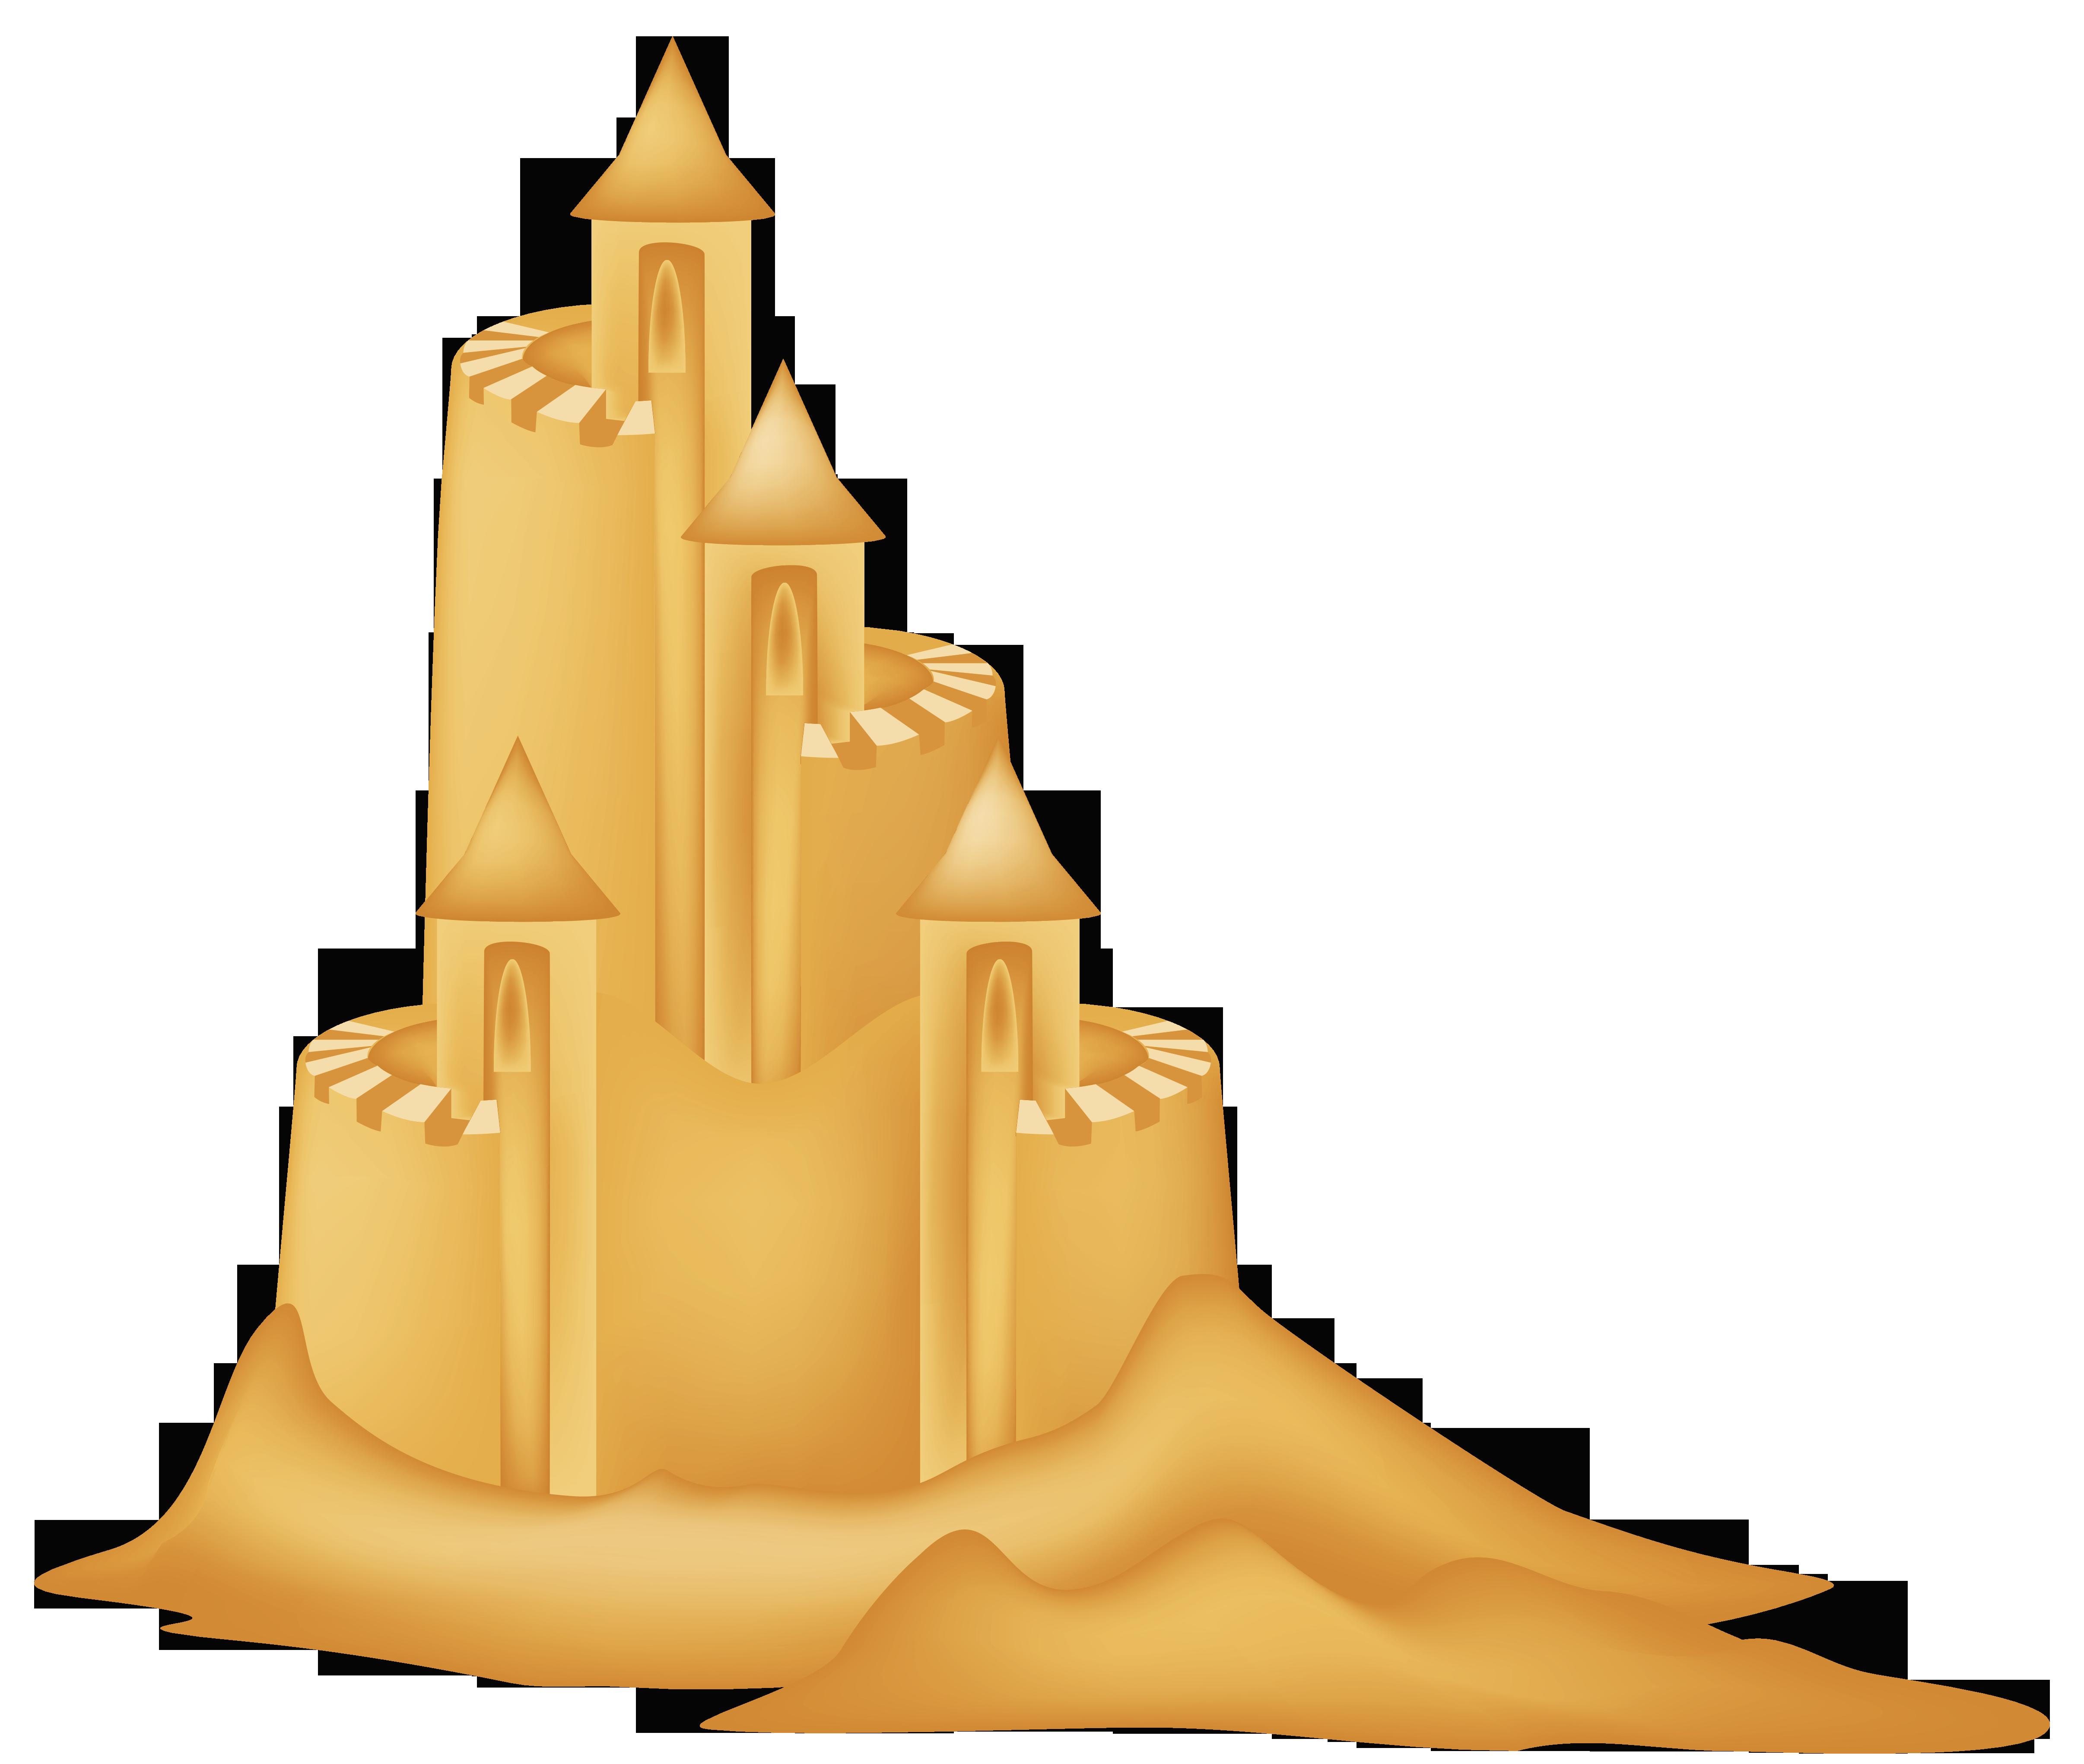 Sand castle sandcastle clipar - Sandcastle Clipart